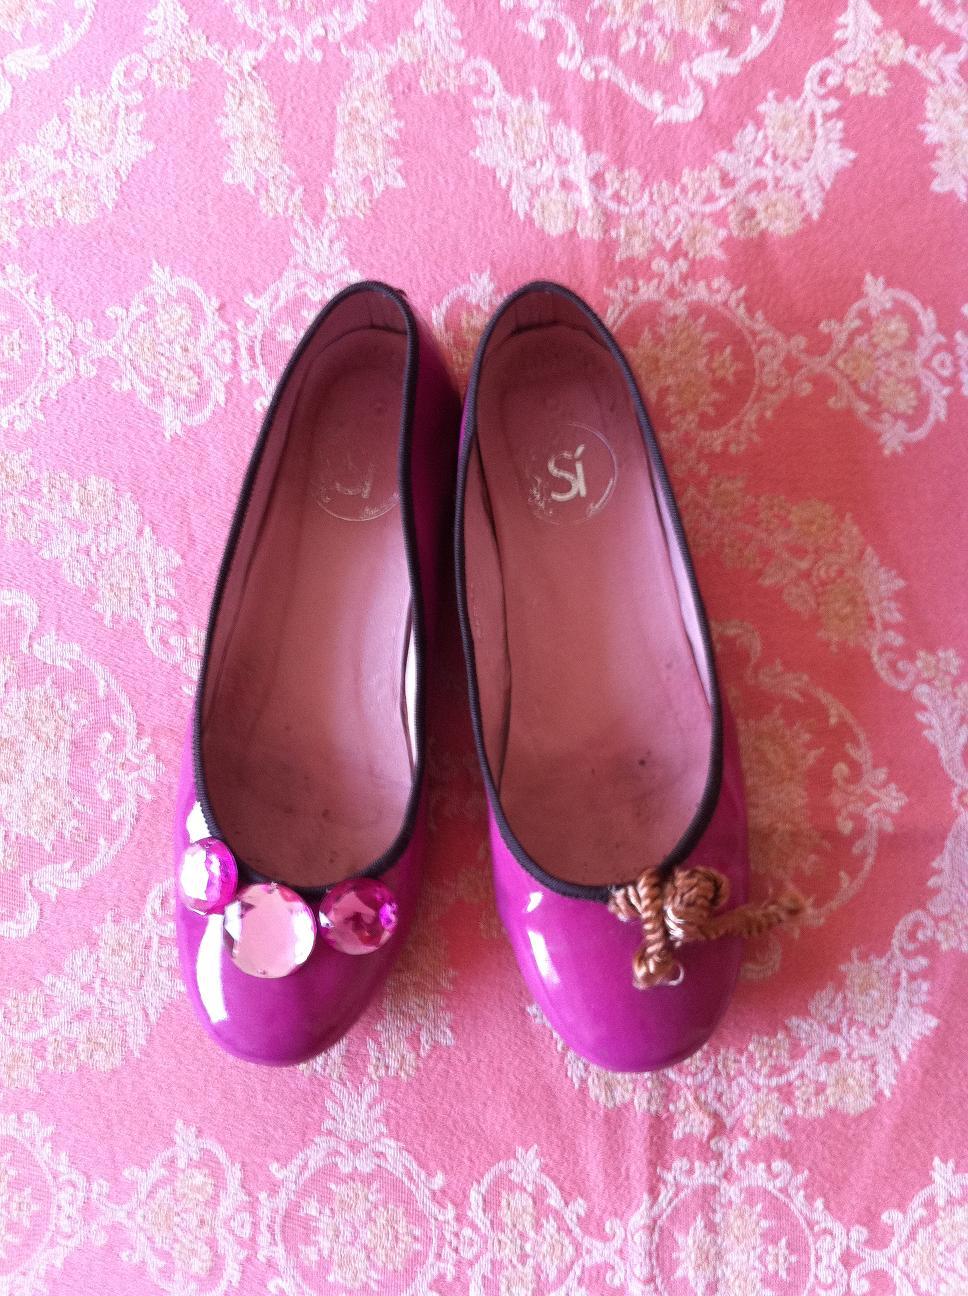 shoe-makeover1.jpg